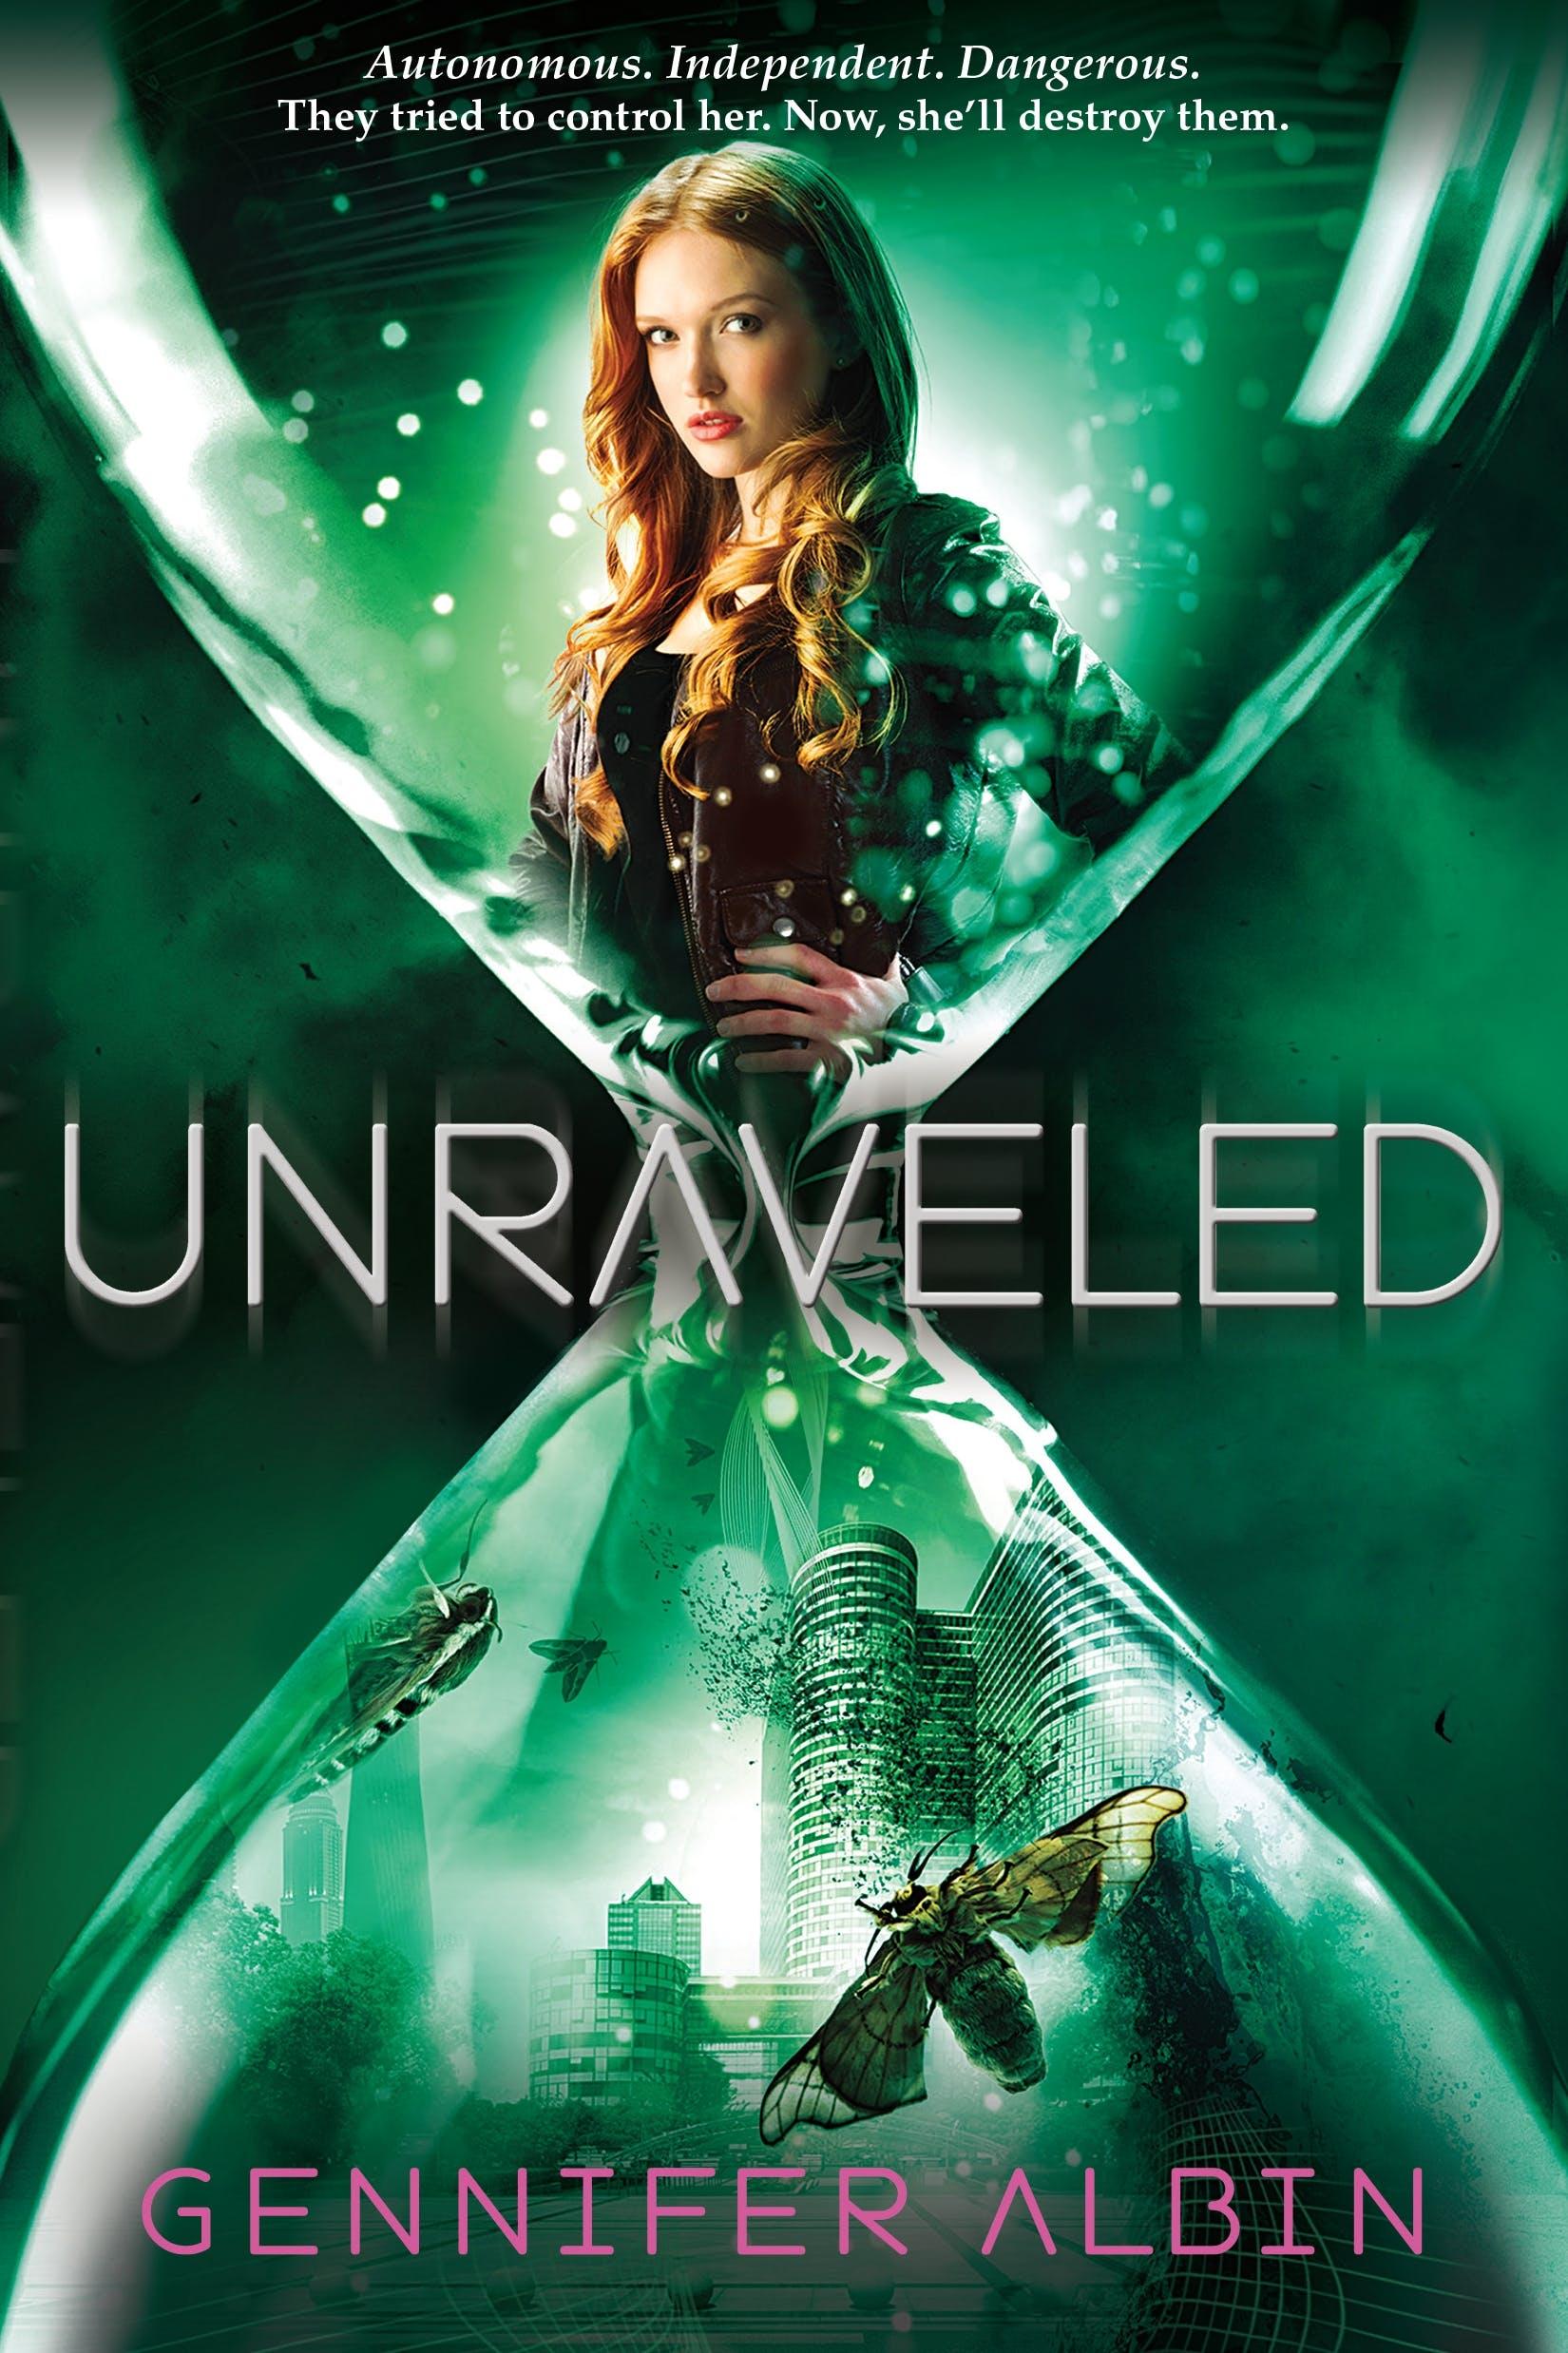 Image of Unraveled